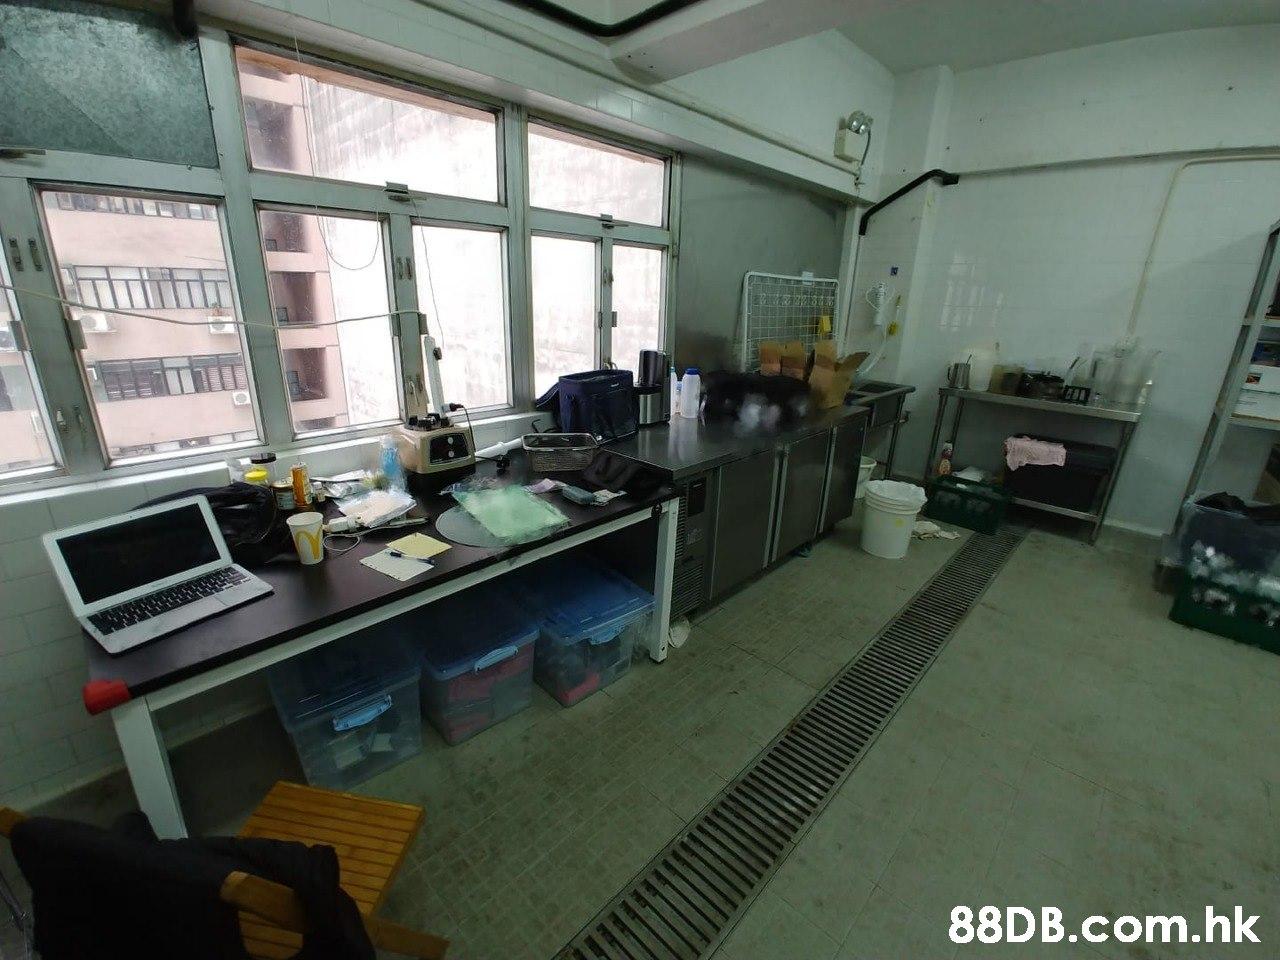 .hk  Property,Building,Room,Machine,Interior design